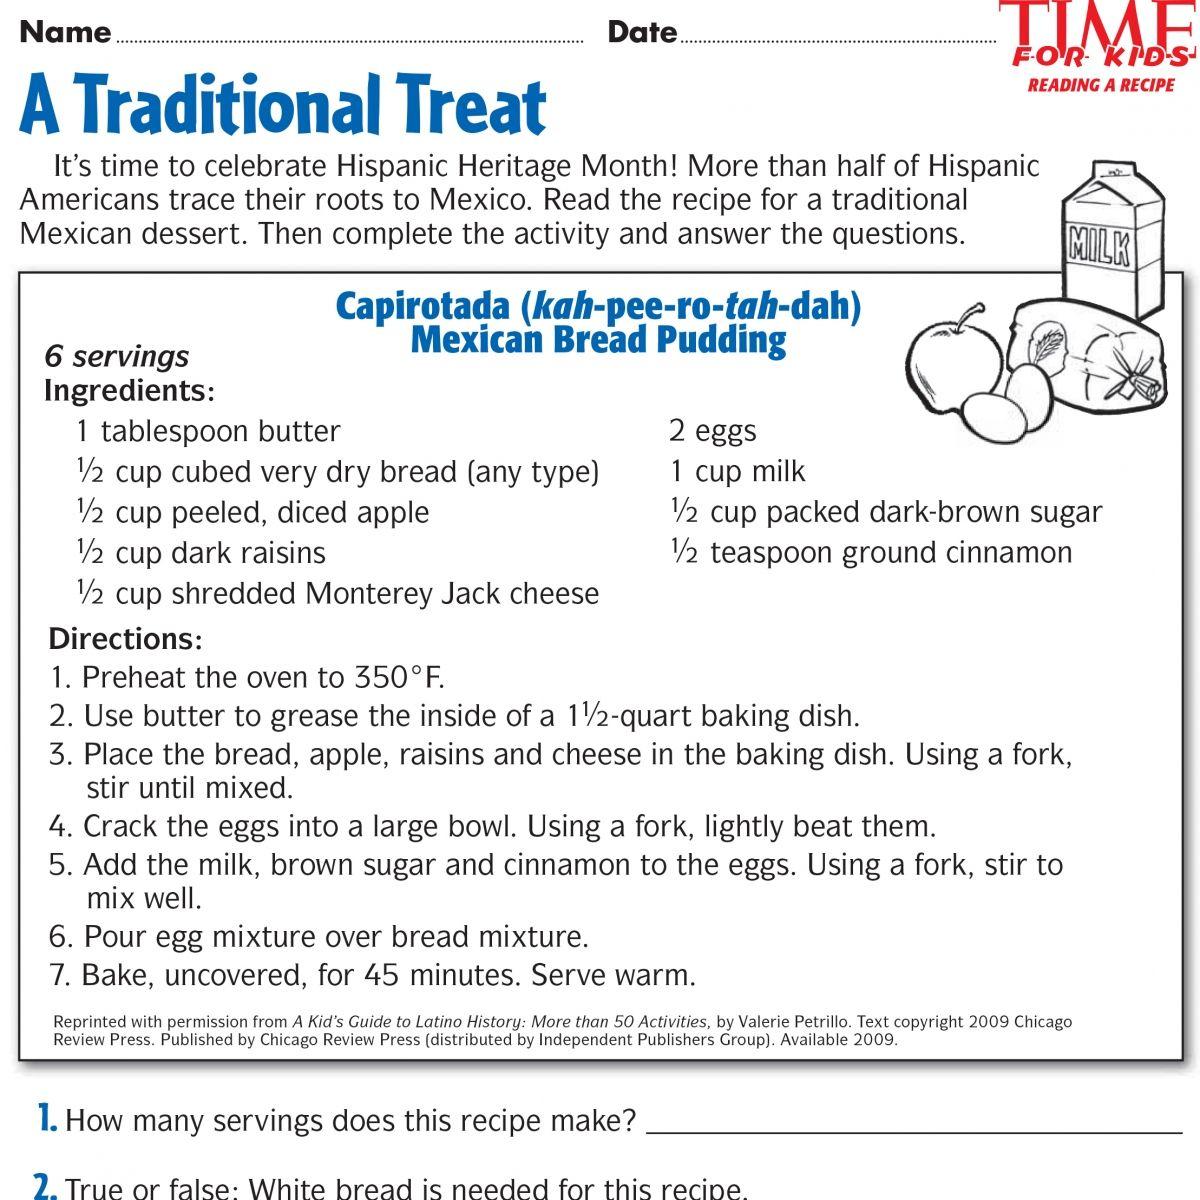 Printables For Hispanic Heritage Month | Time For Kids | Ideas | Hispanic Heritage Month Printable Worksheets